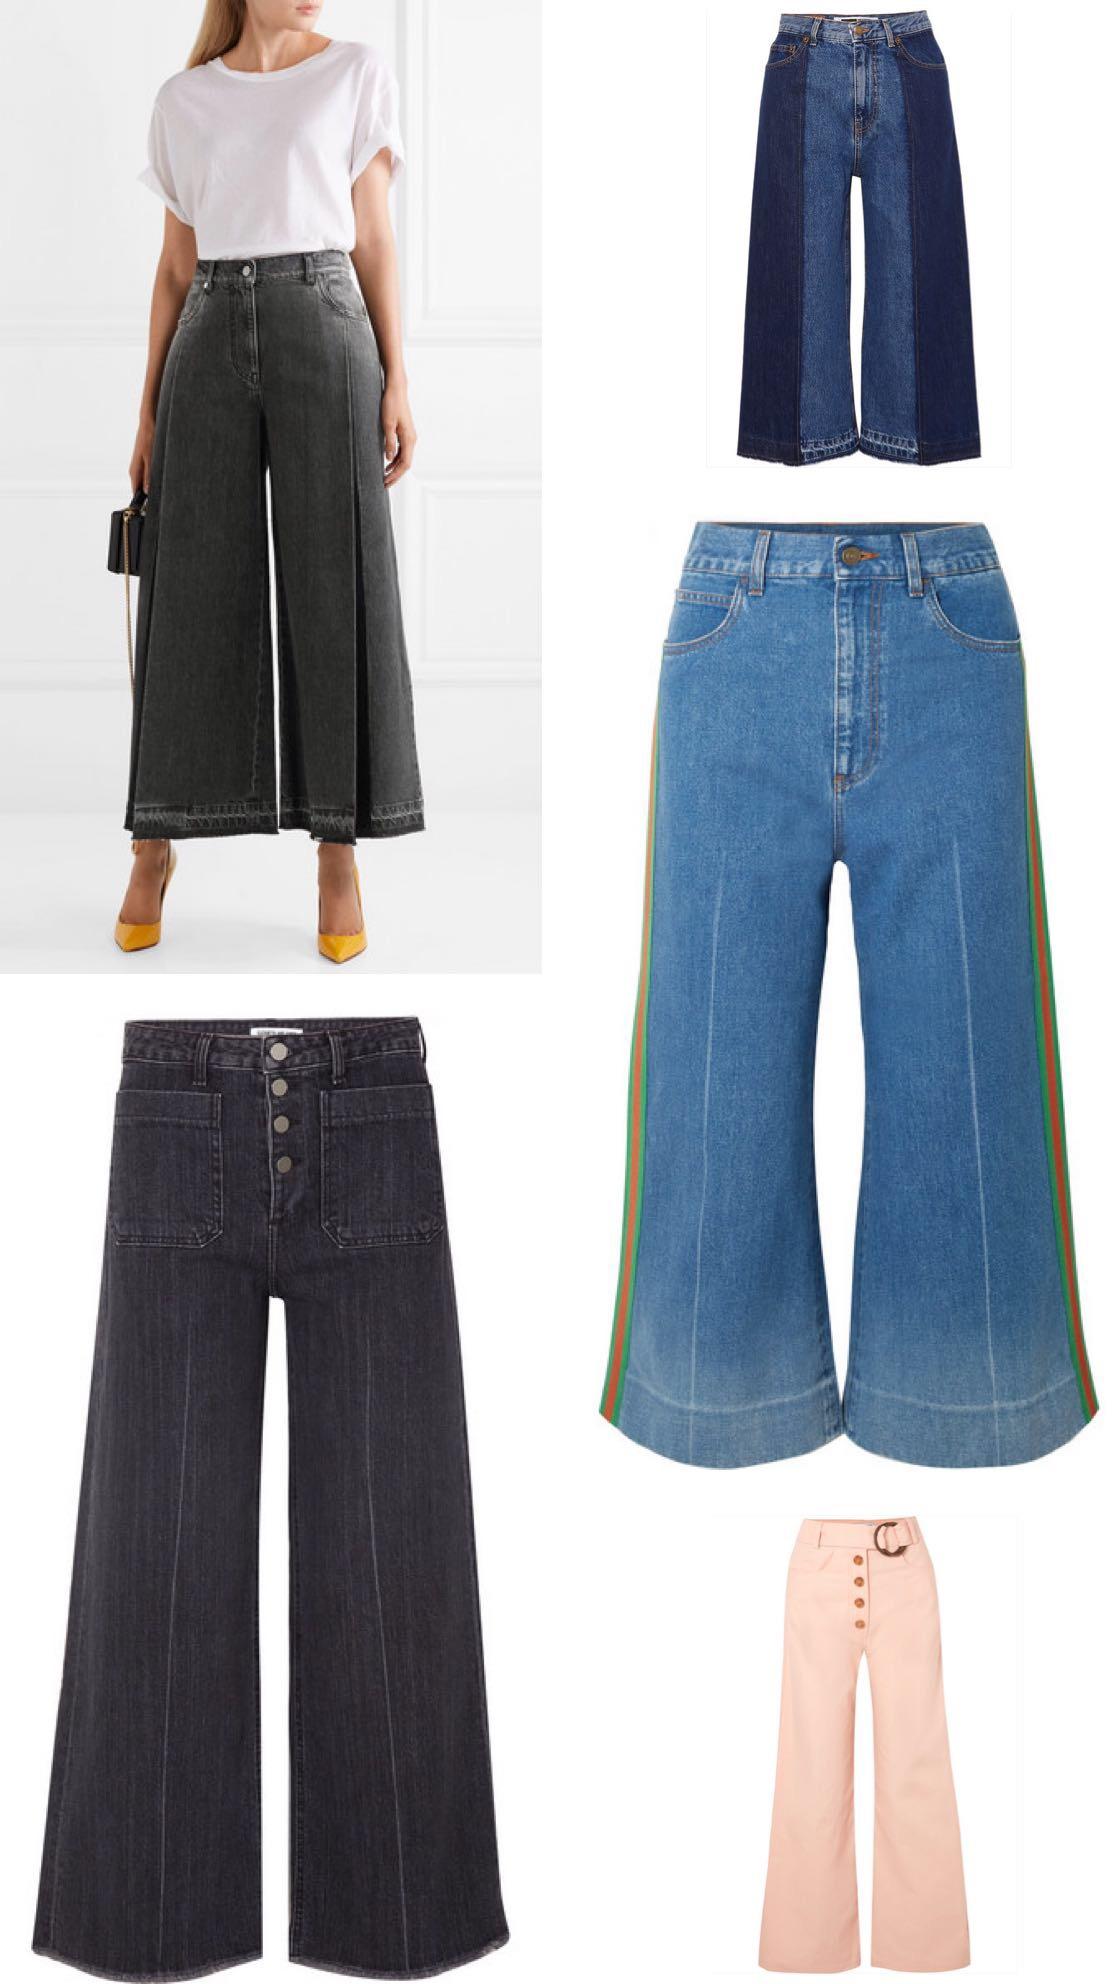 jeans luksus